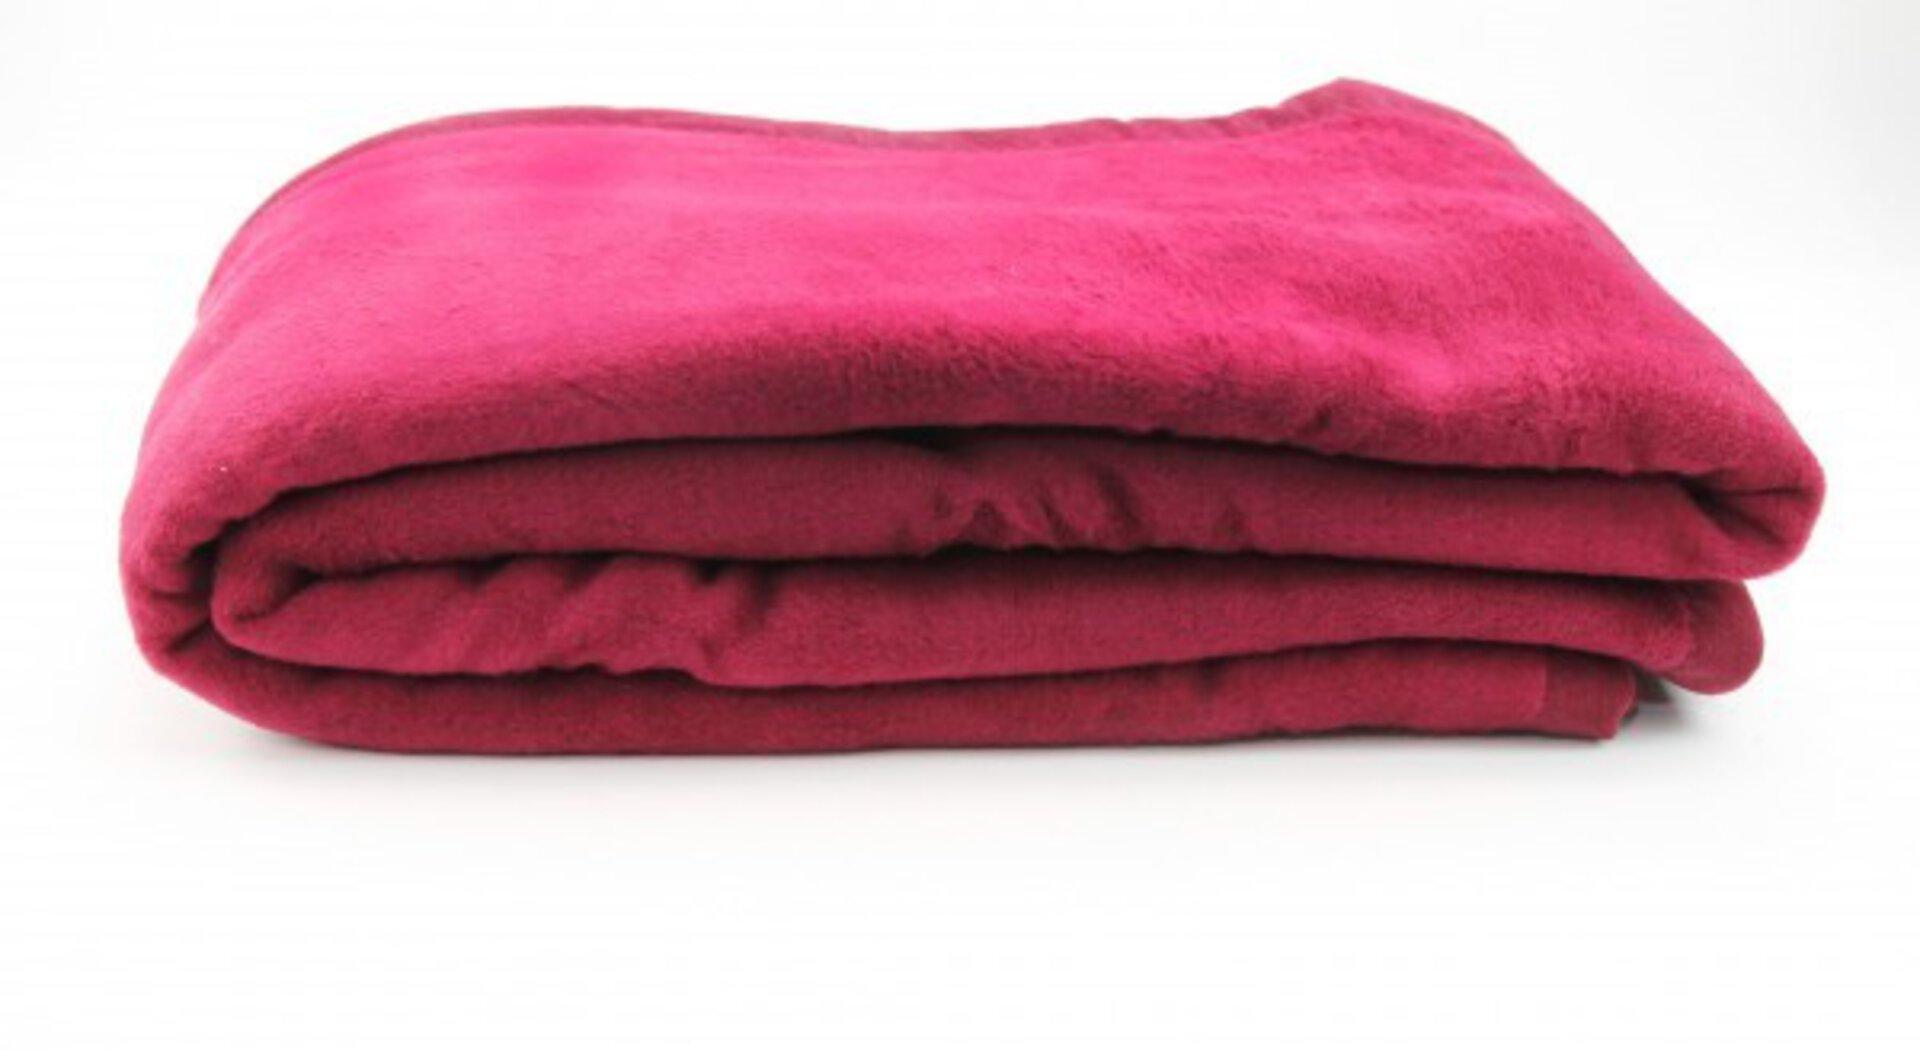 Wohndecke Casa Nova Textil rot 150 x 200 cm